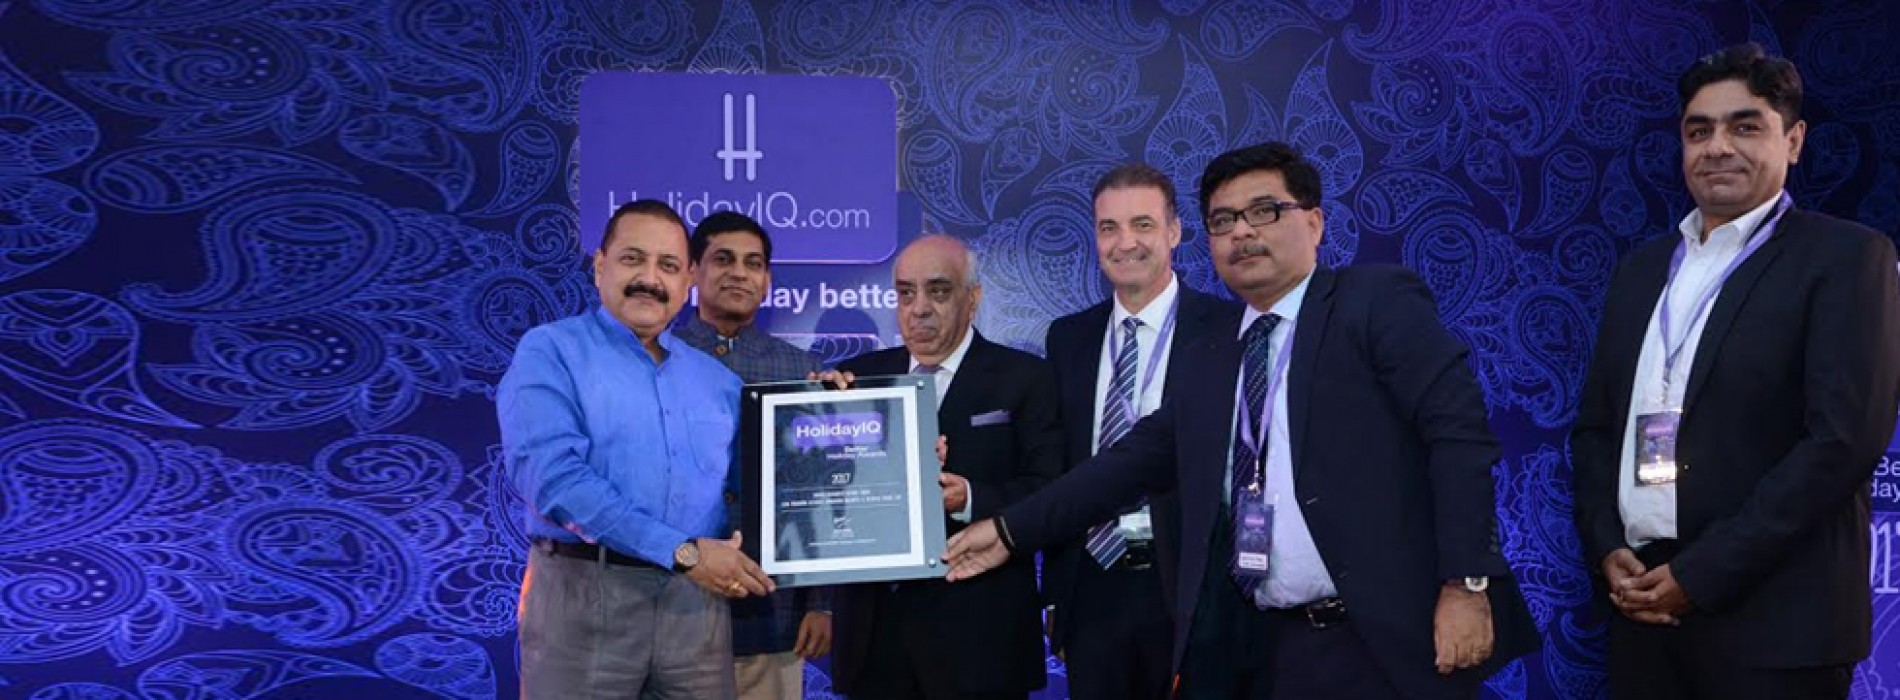 Mahindra Holidays voted India's Favorite Resort Chain at the HolidayIQ Awards